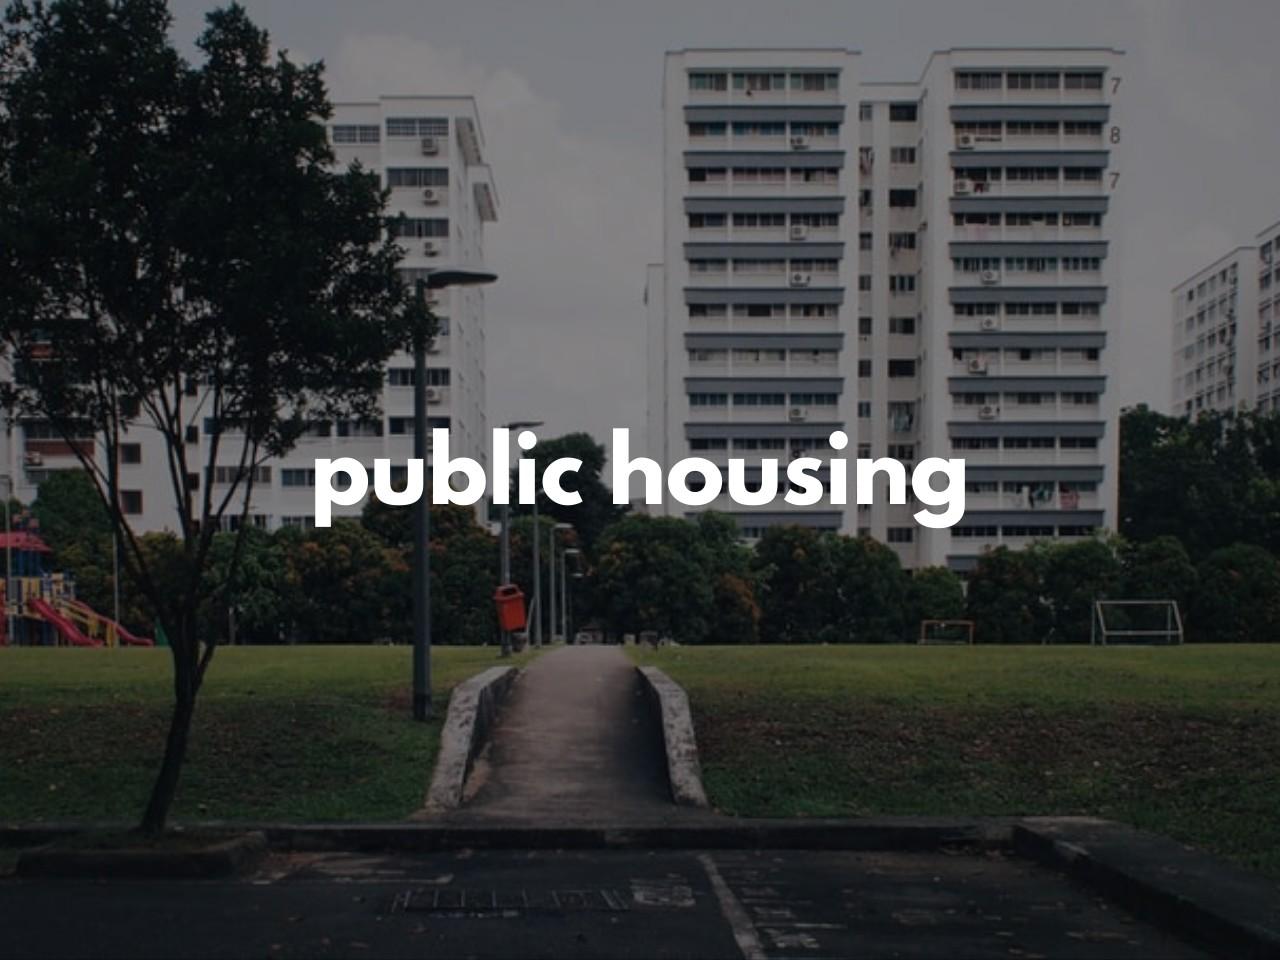 public housing : 公営住宅